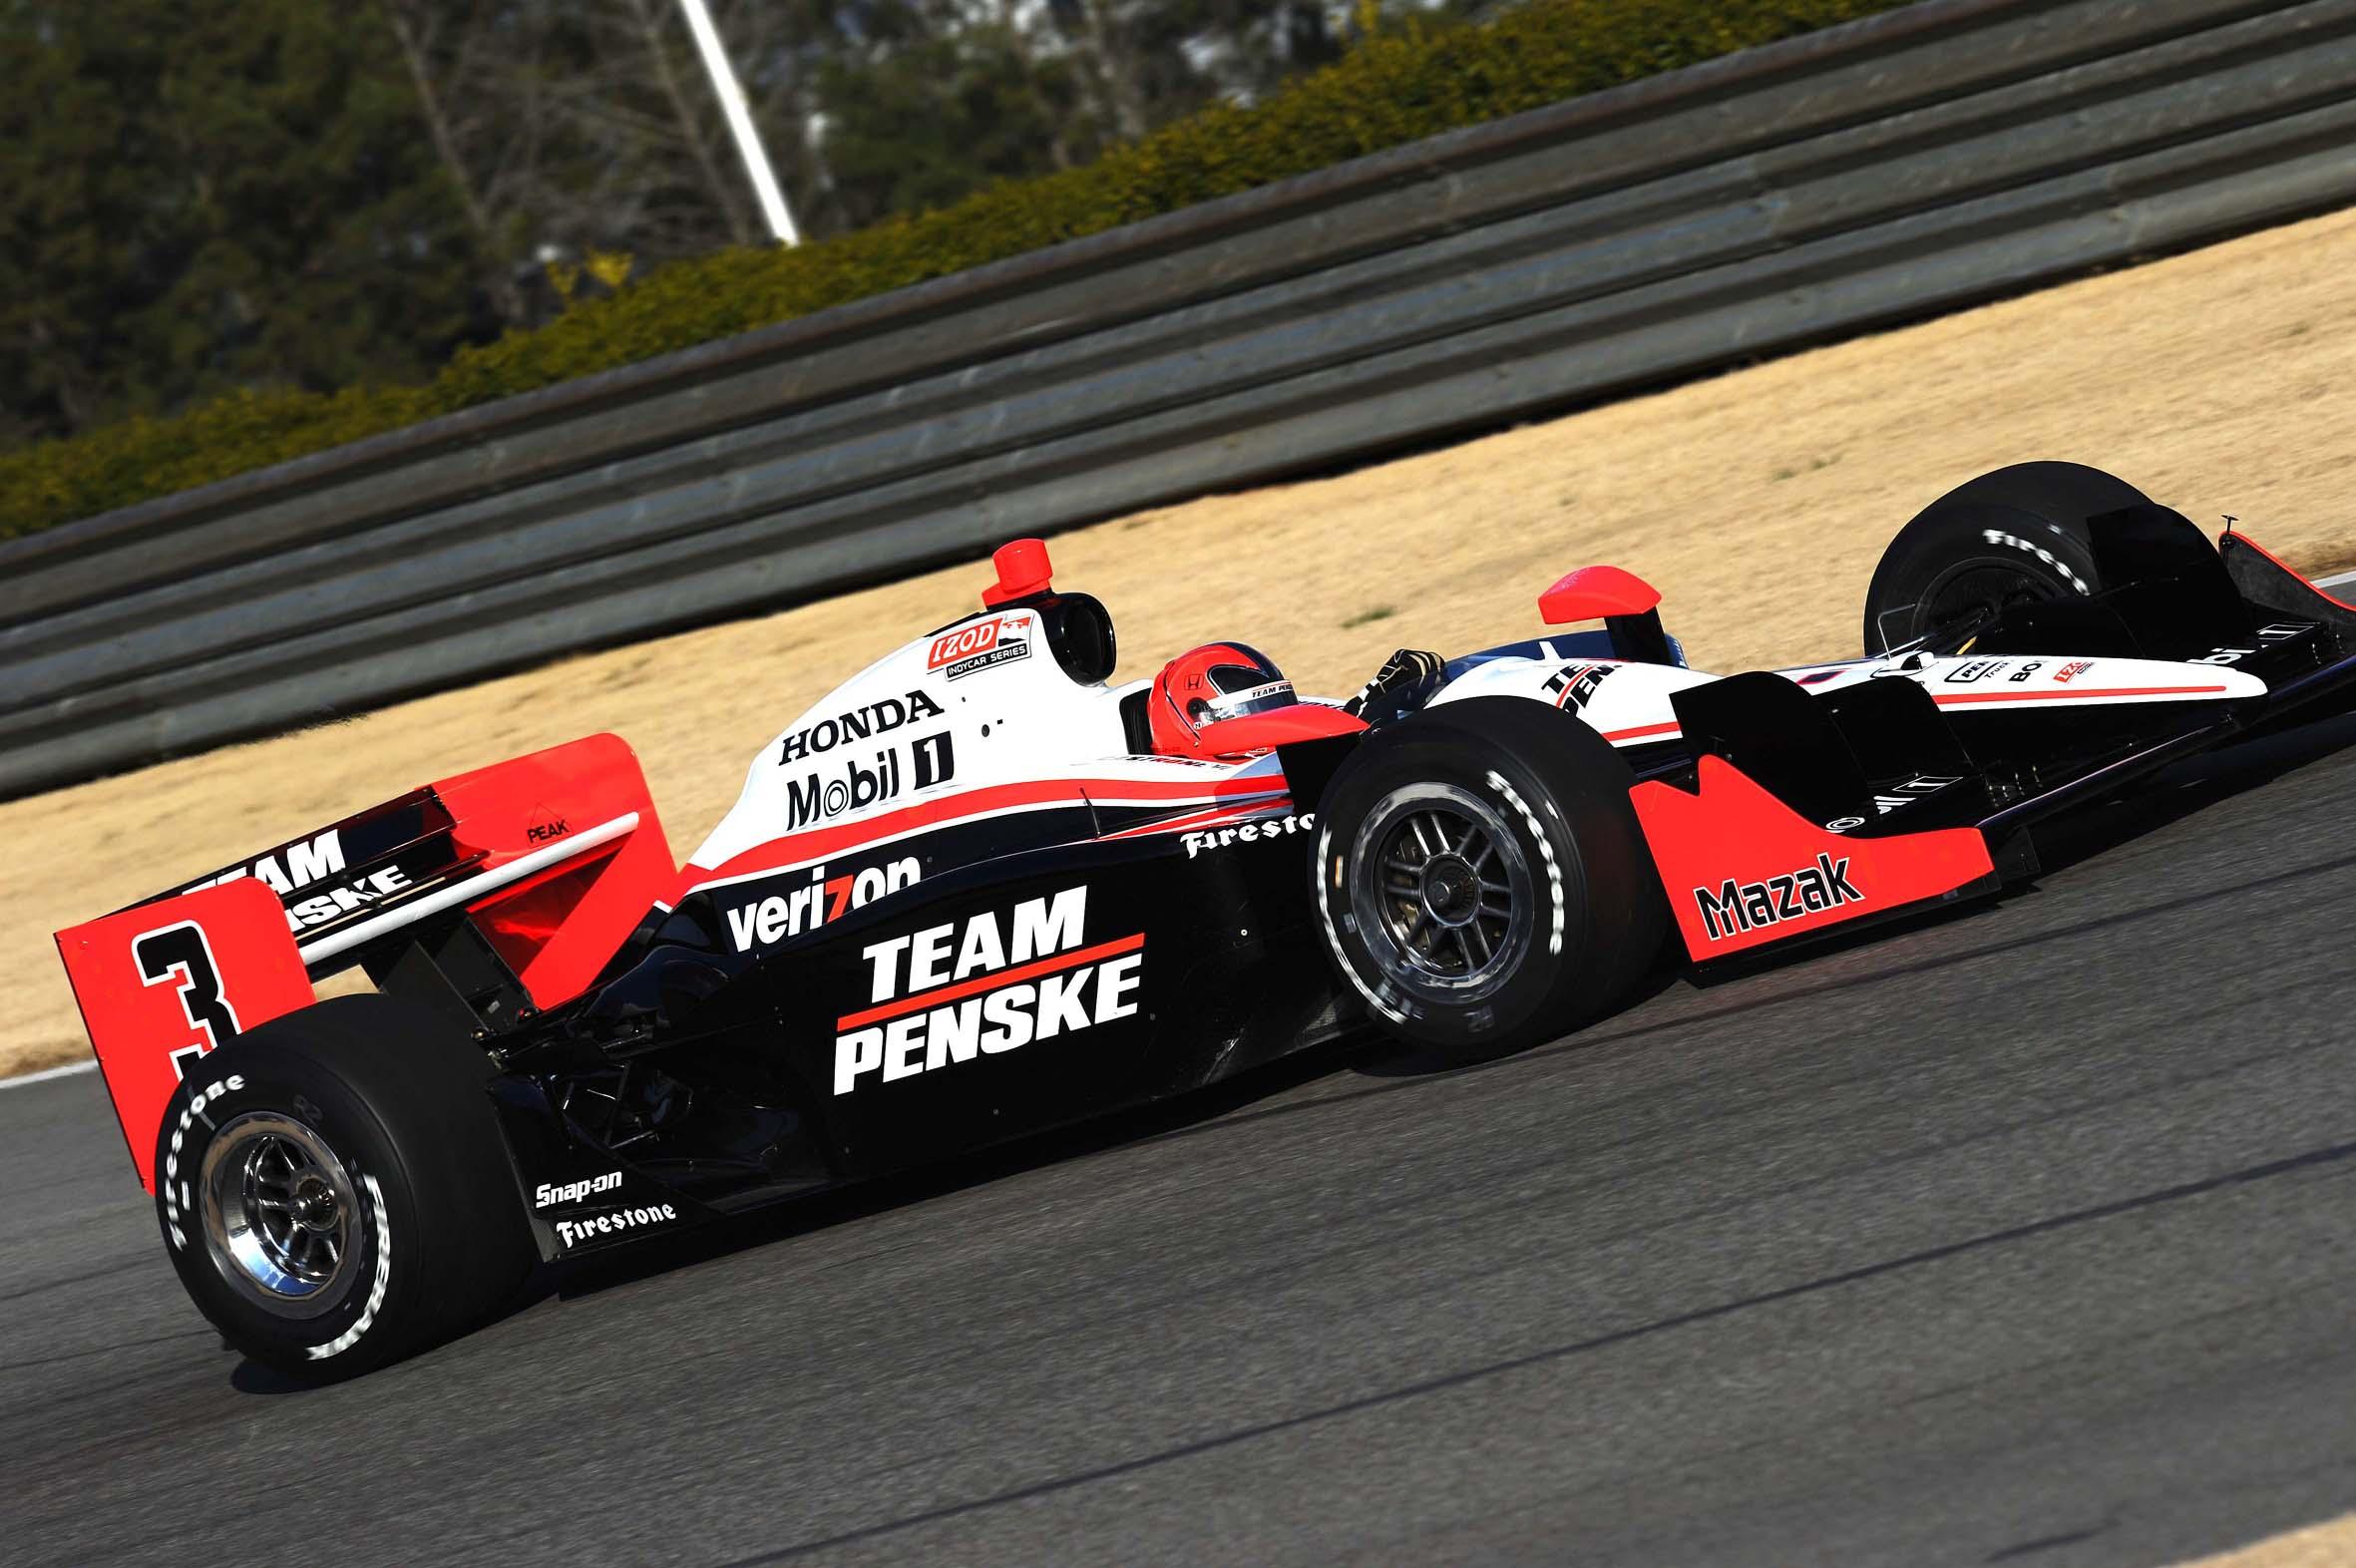 Circuito Barber : Indycar alonso alonso buen test en barber con el andretti de